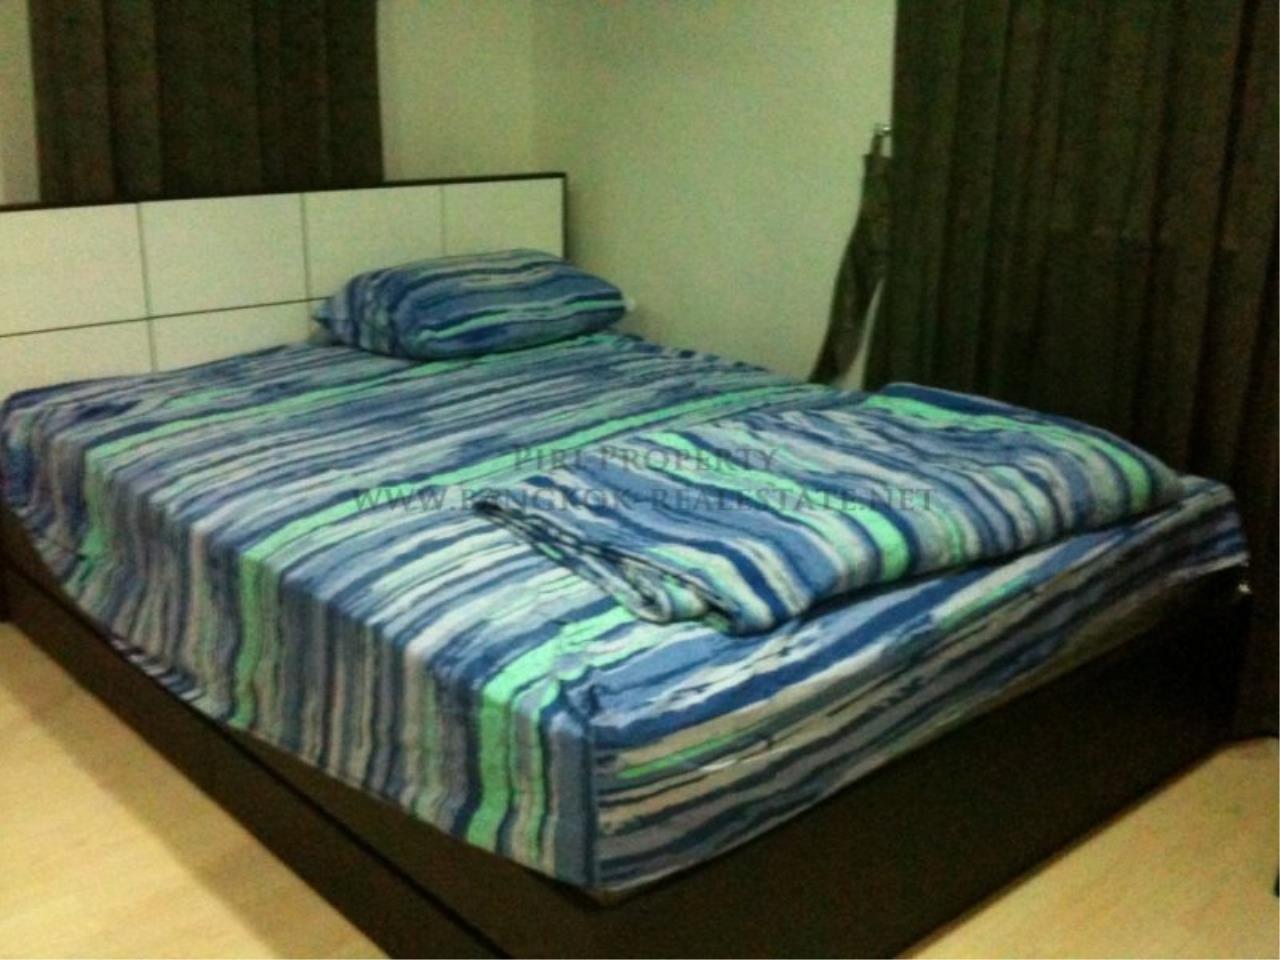 Piri Property Agency's My Resort Bangkok - Condo on 19th Floor for rent 1